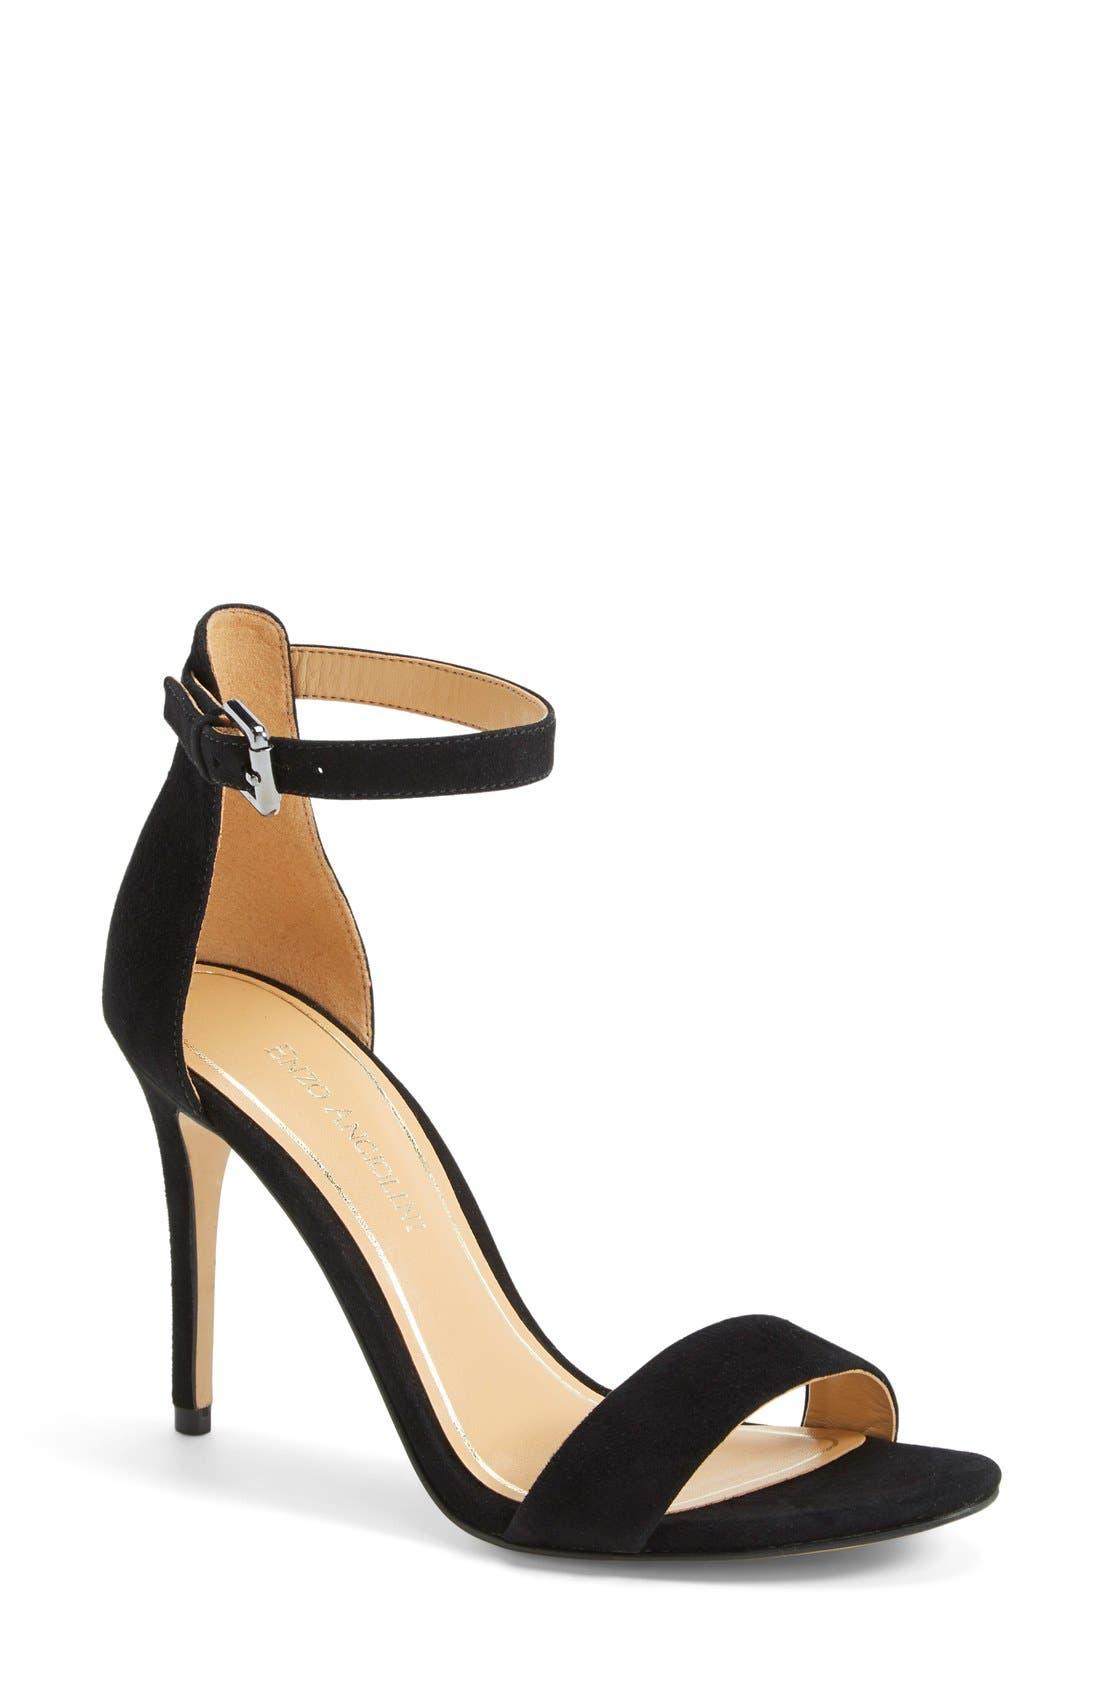 'Manna' Ankle Strap Sandal,                             Main thumbnail 1, color,                             001